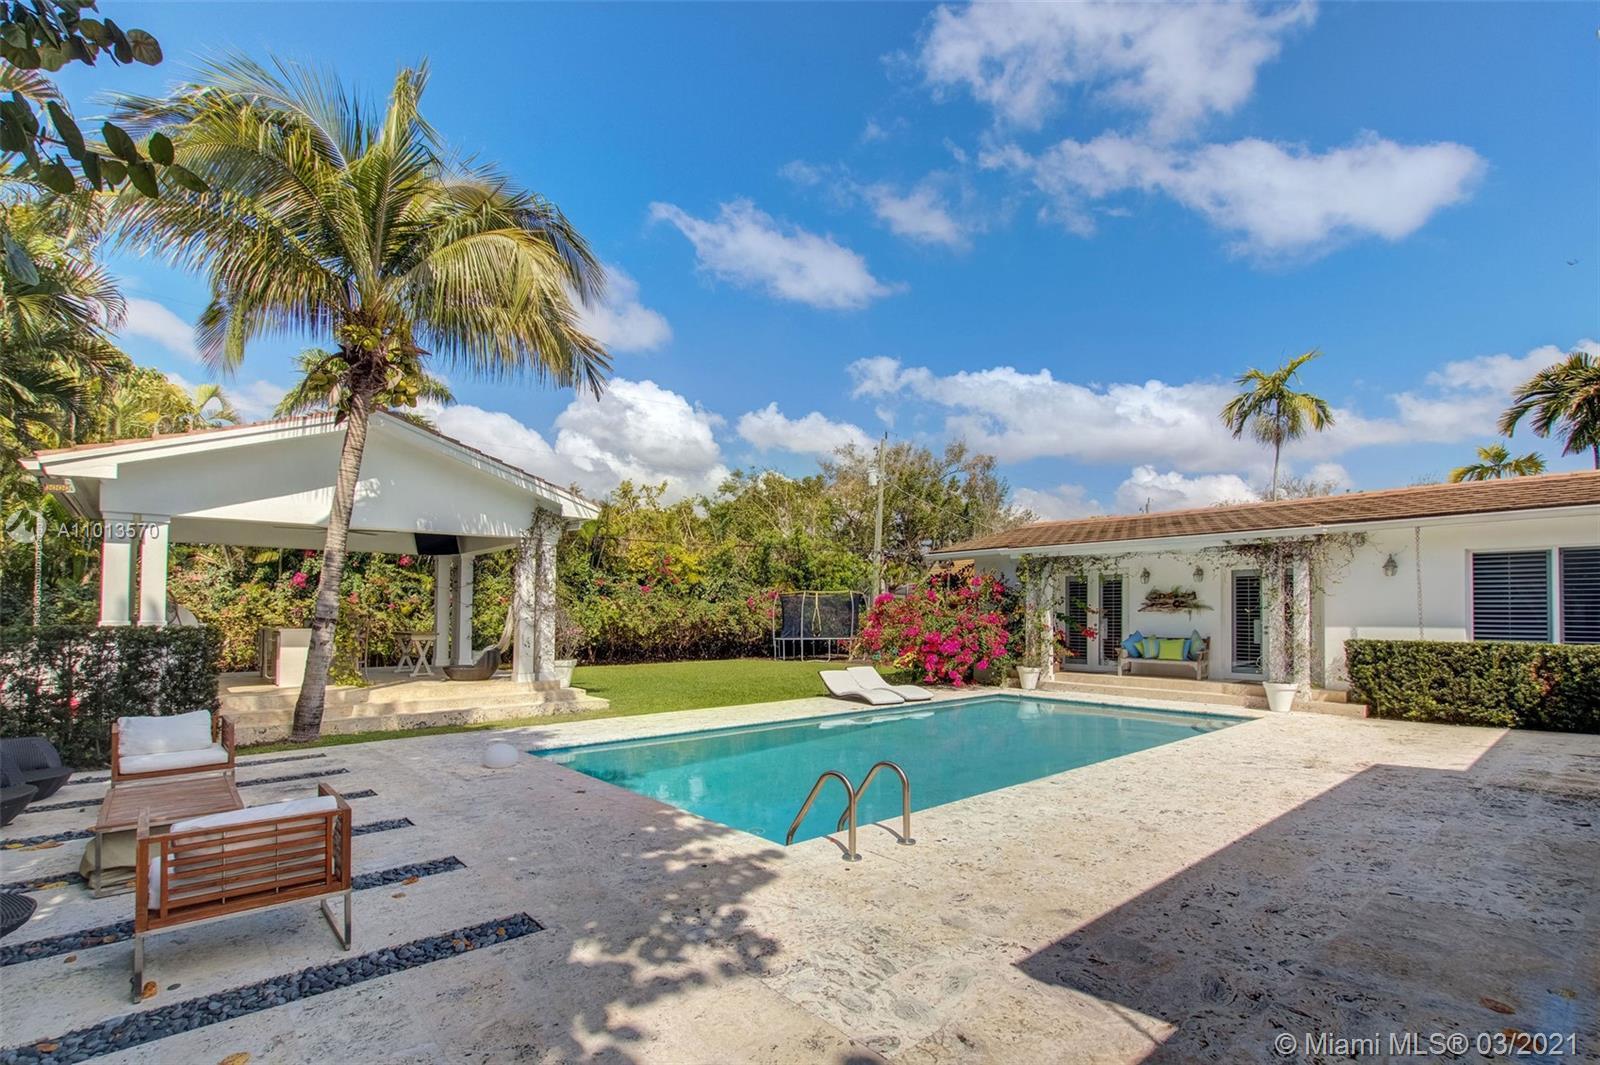 Riviera - 719 Paradiso Ave, Coral Gables, FL 33146